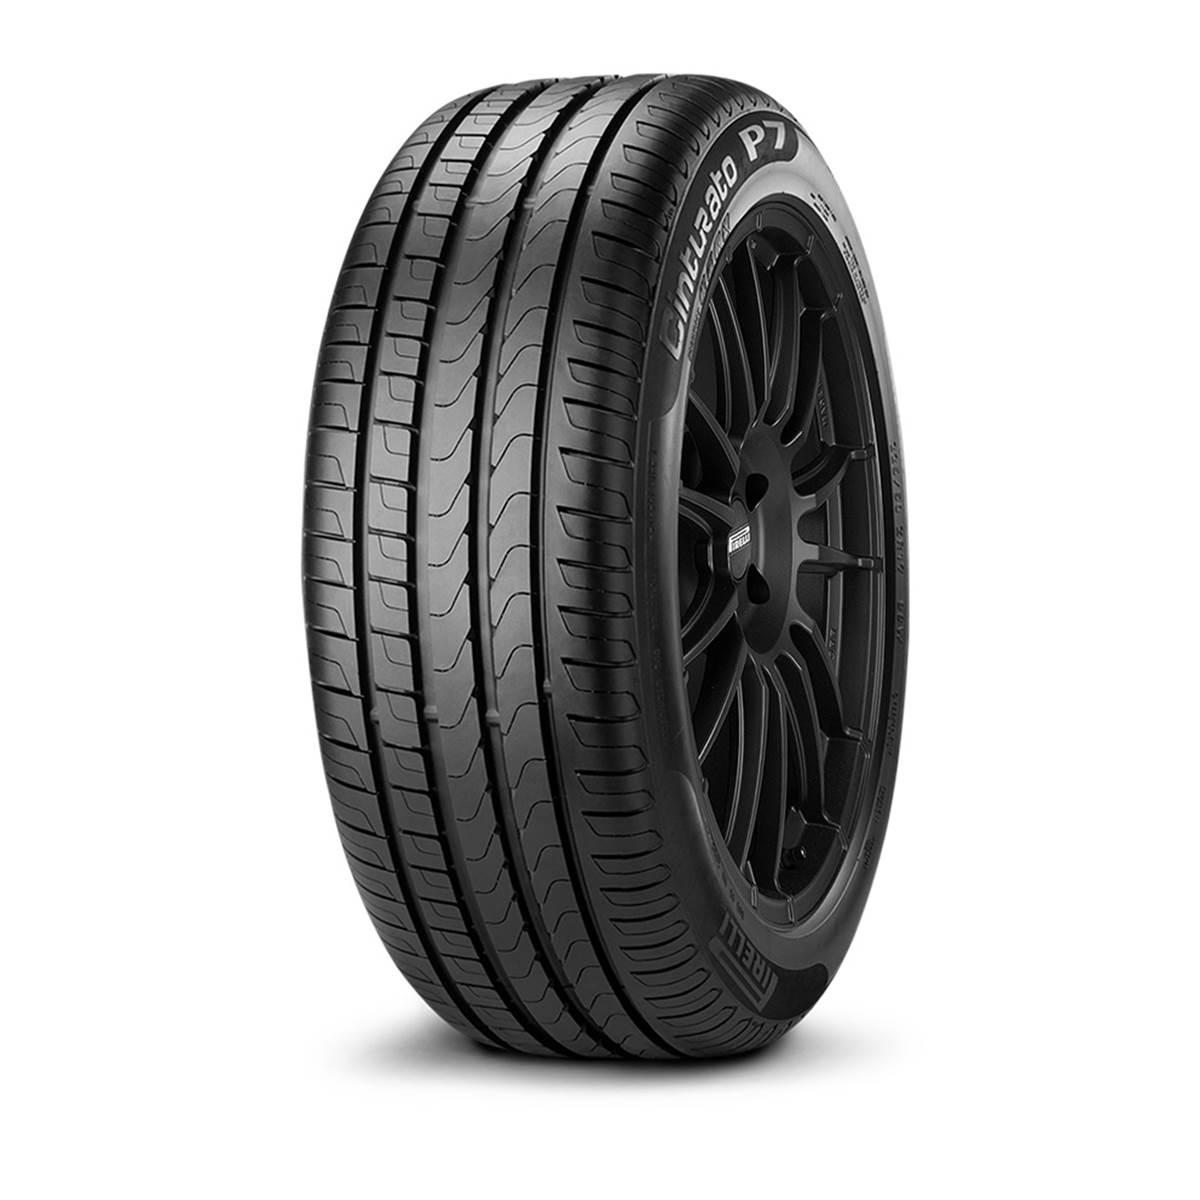 Pneu Pirelli 225/50R17 94W Cinturato P7